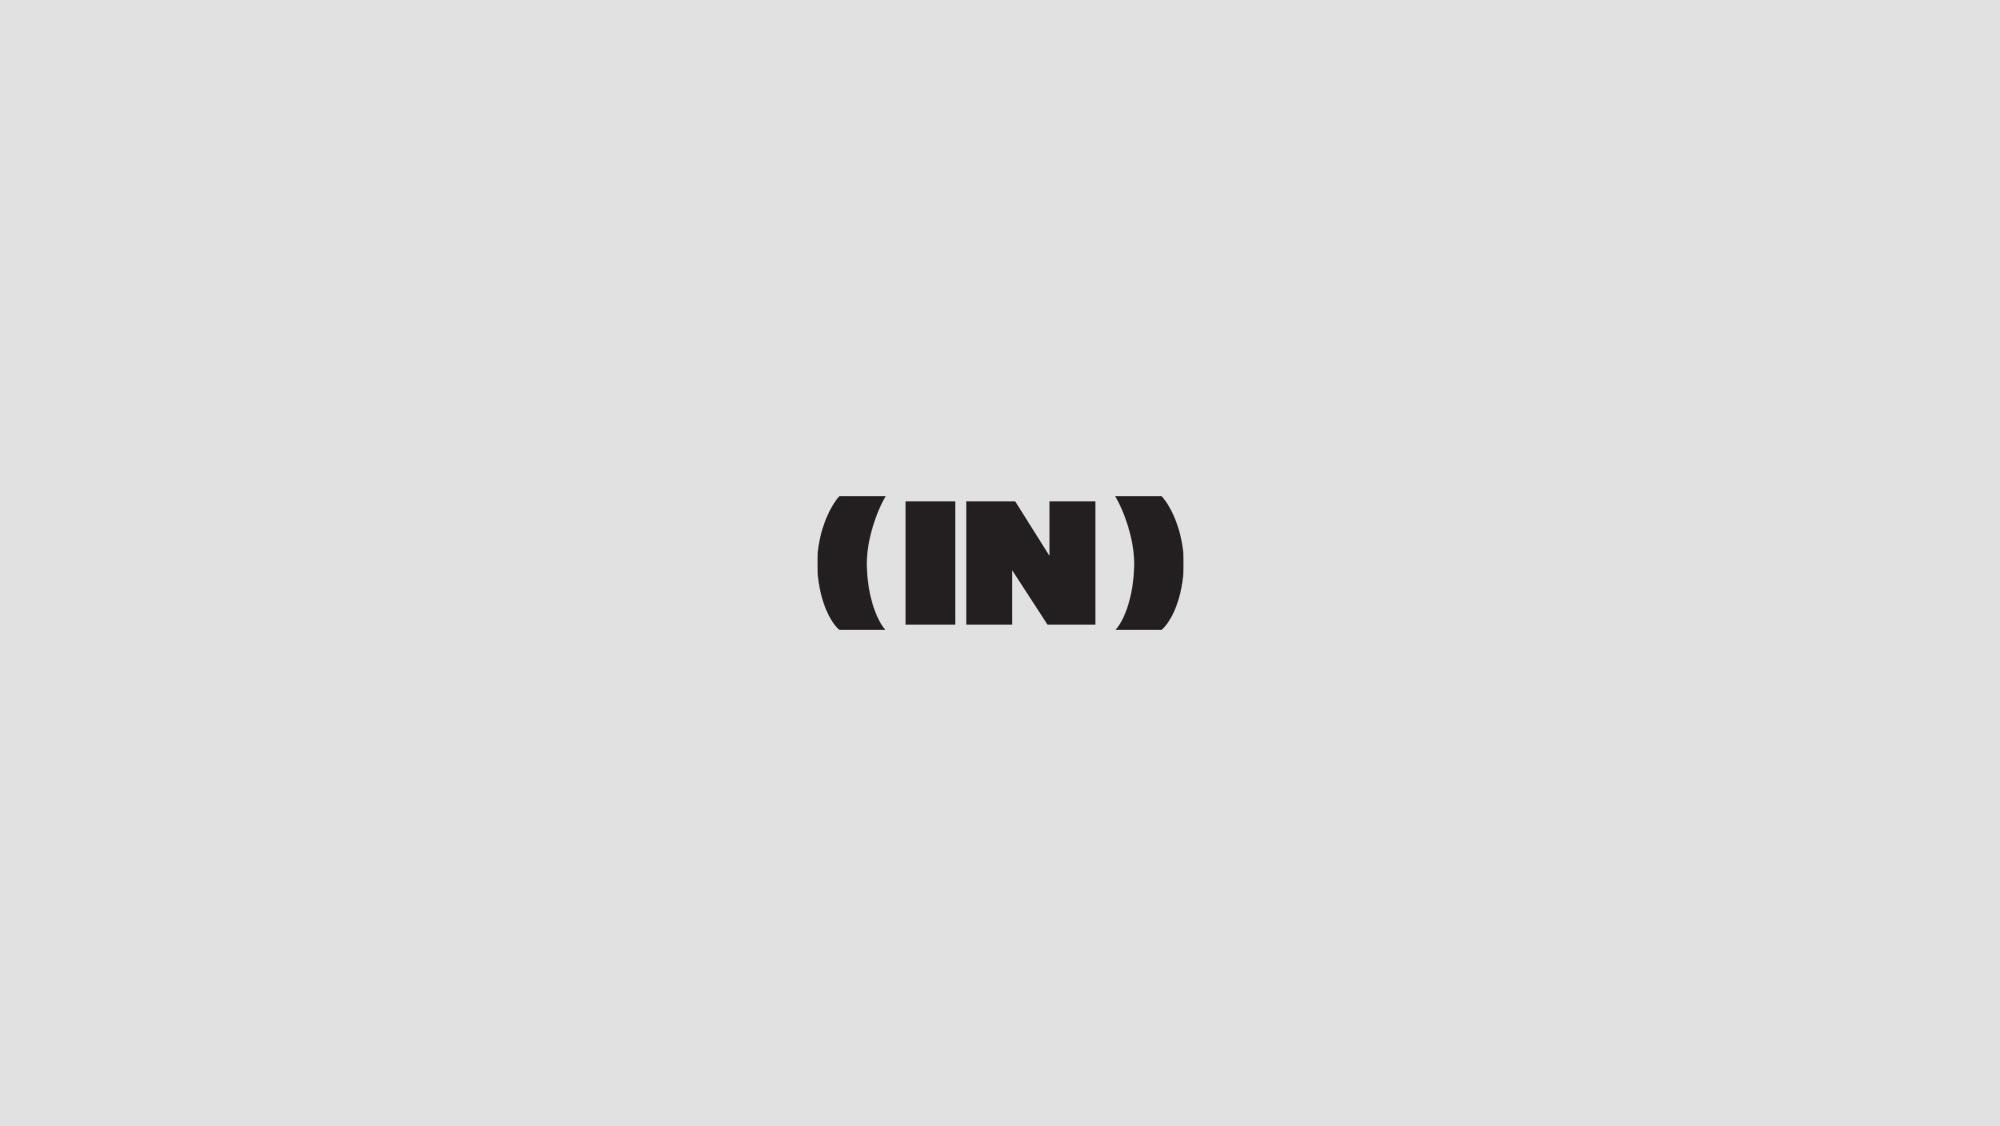 Isolation Nation Alternate Logo Design